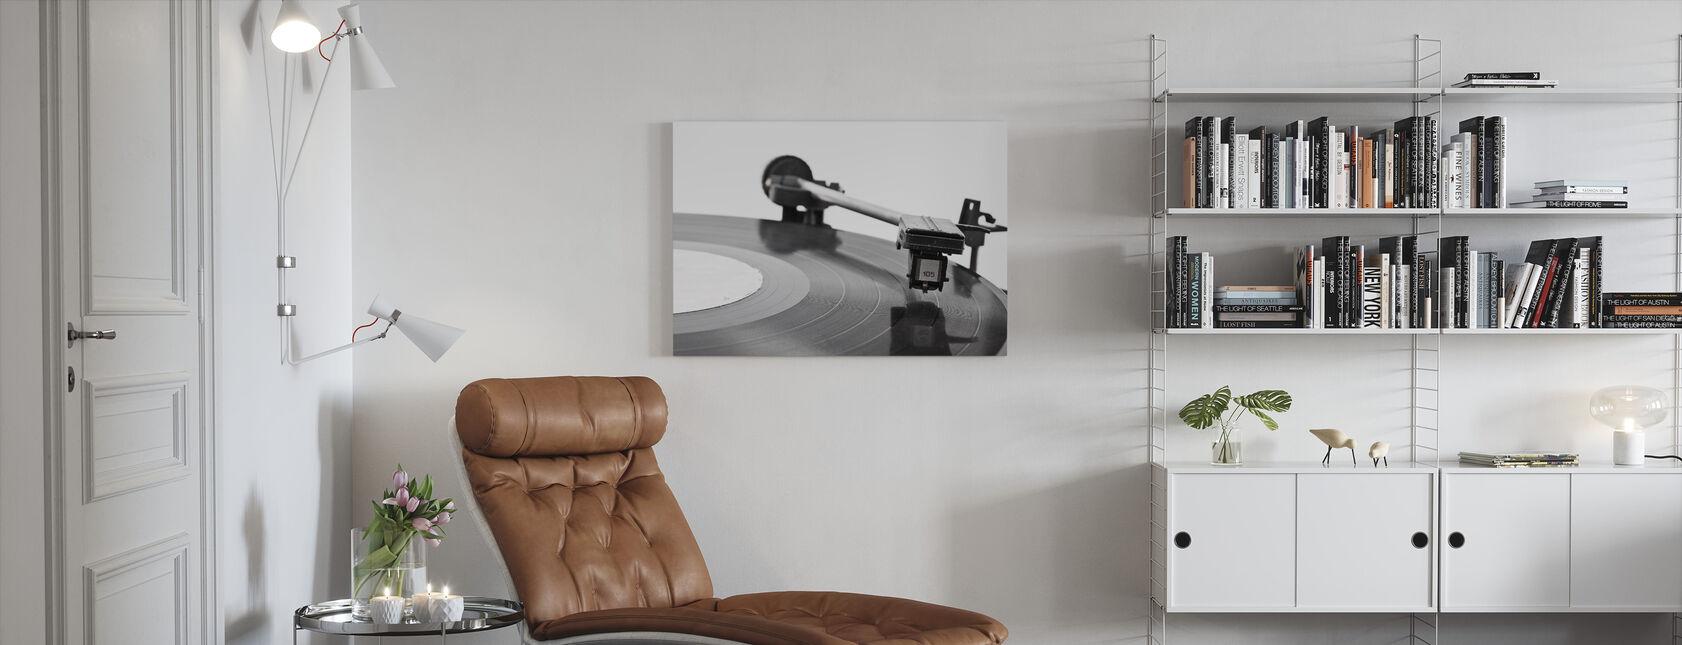 Gammel Vinyl spiller - Lerretsbilde - Stue